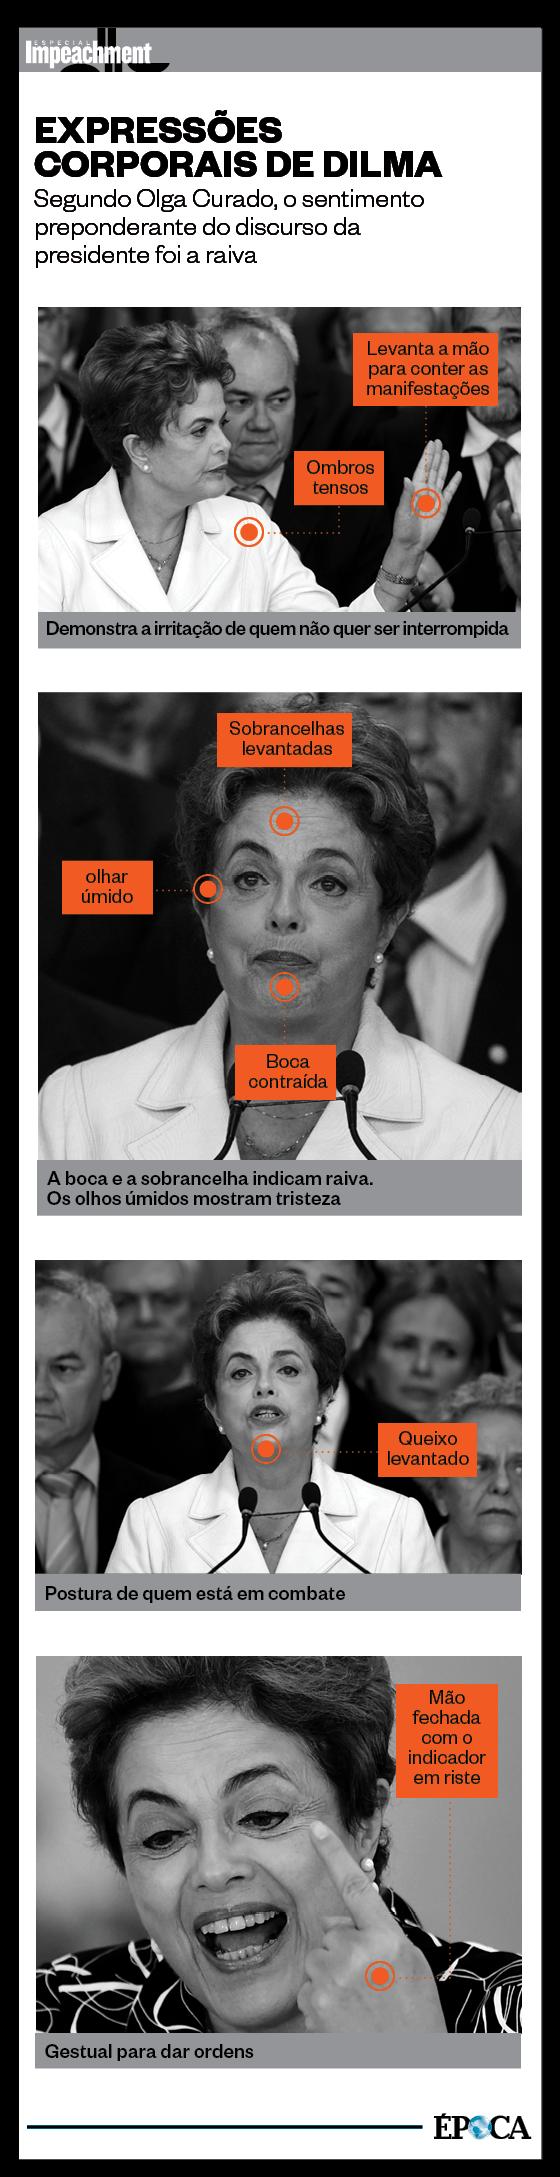 Linguagem Corporal de Dilma Rousseff (Foto: infografia EPOCA)